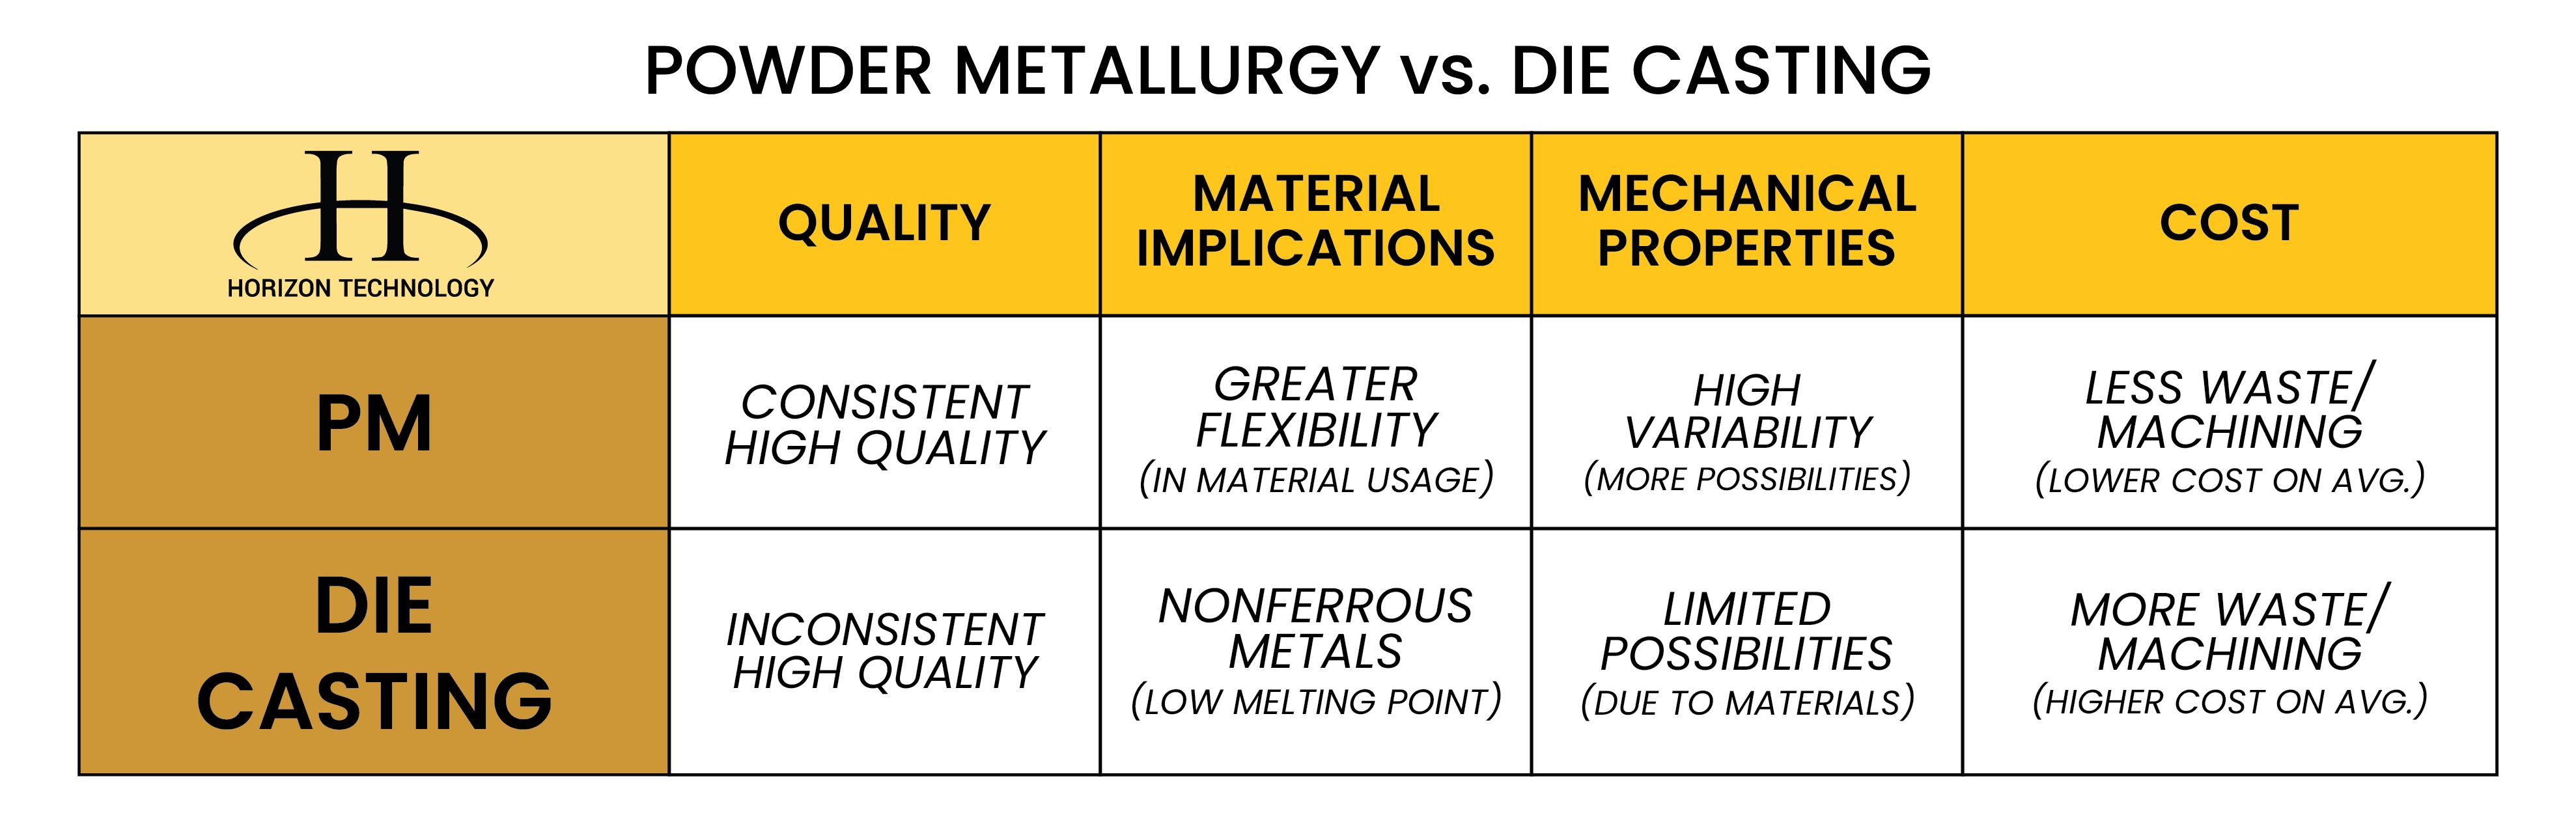 Advantages Of Powder Metallurgy Vs Die Casting